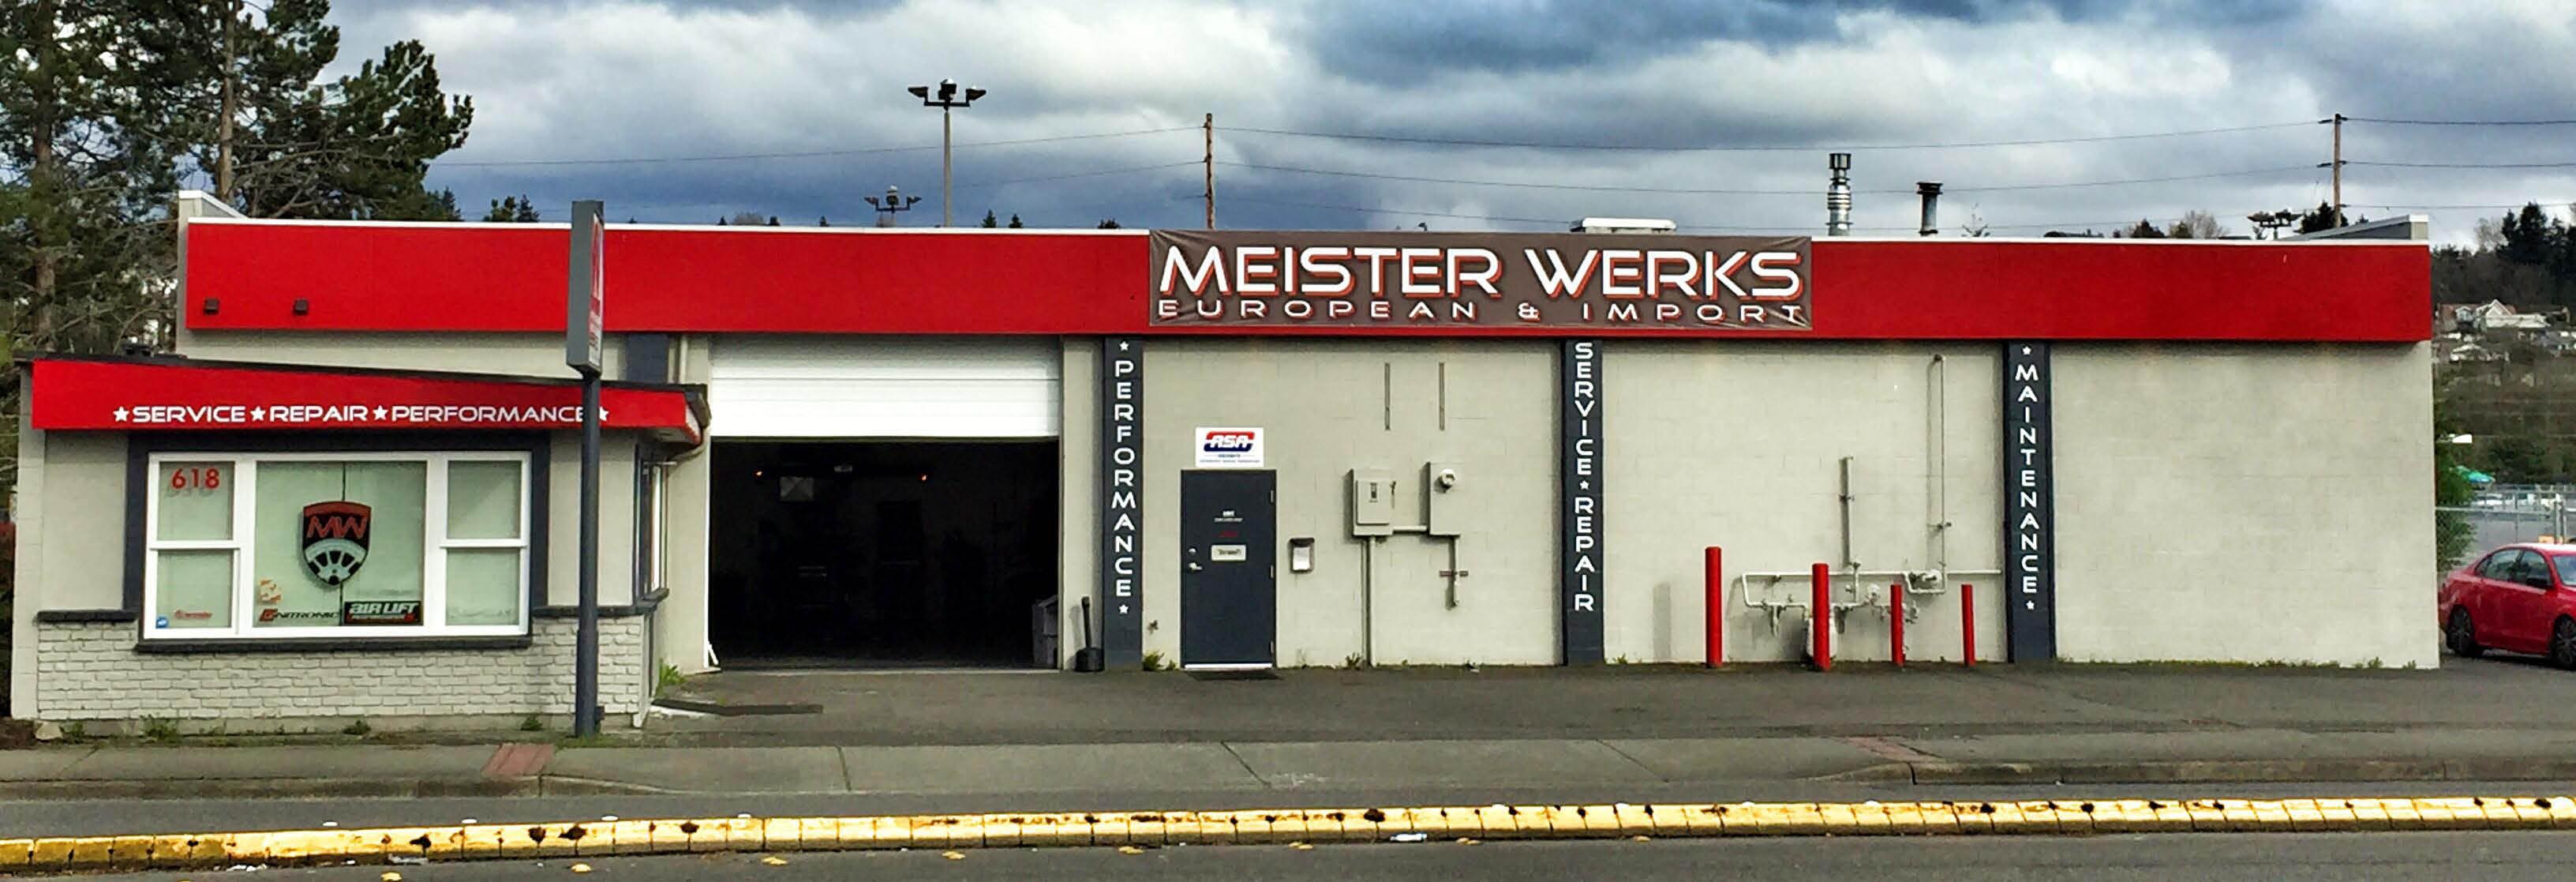 Meister Werks main banner image - Renton, WA